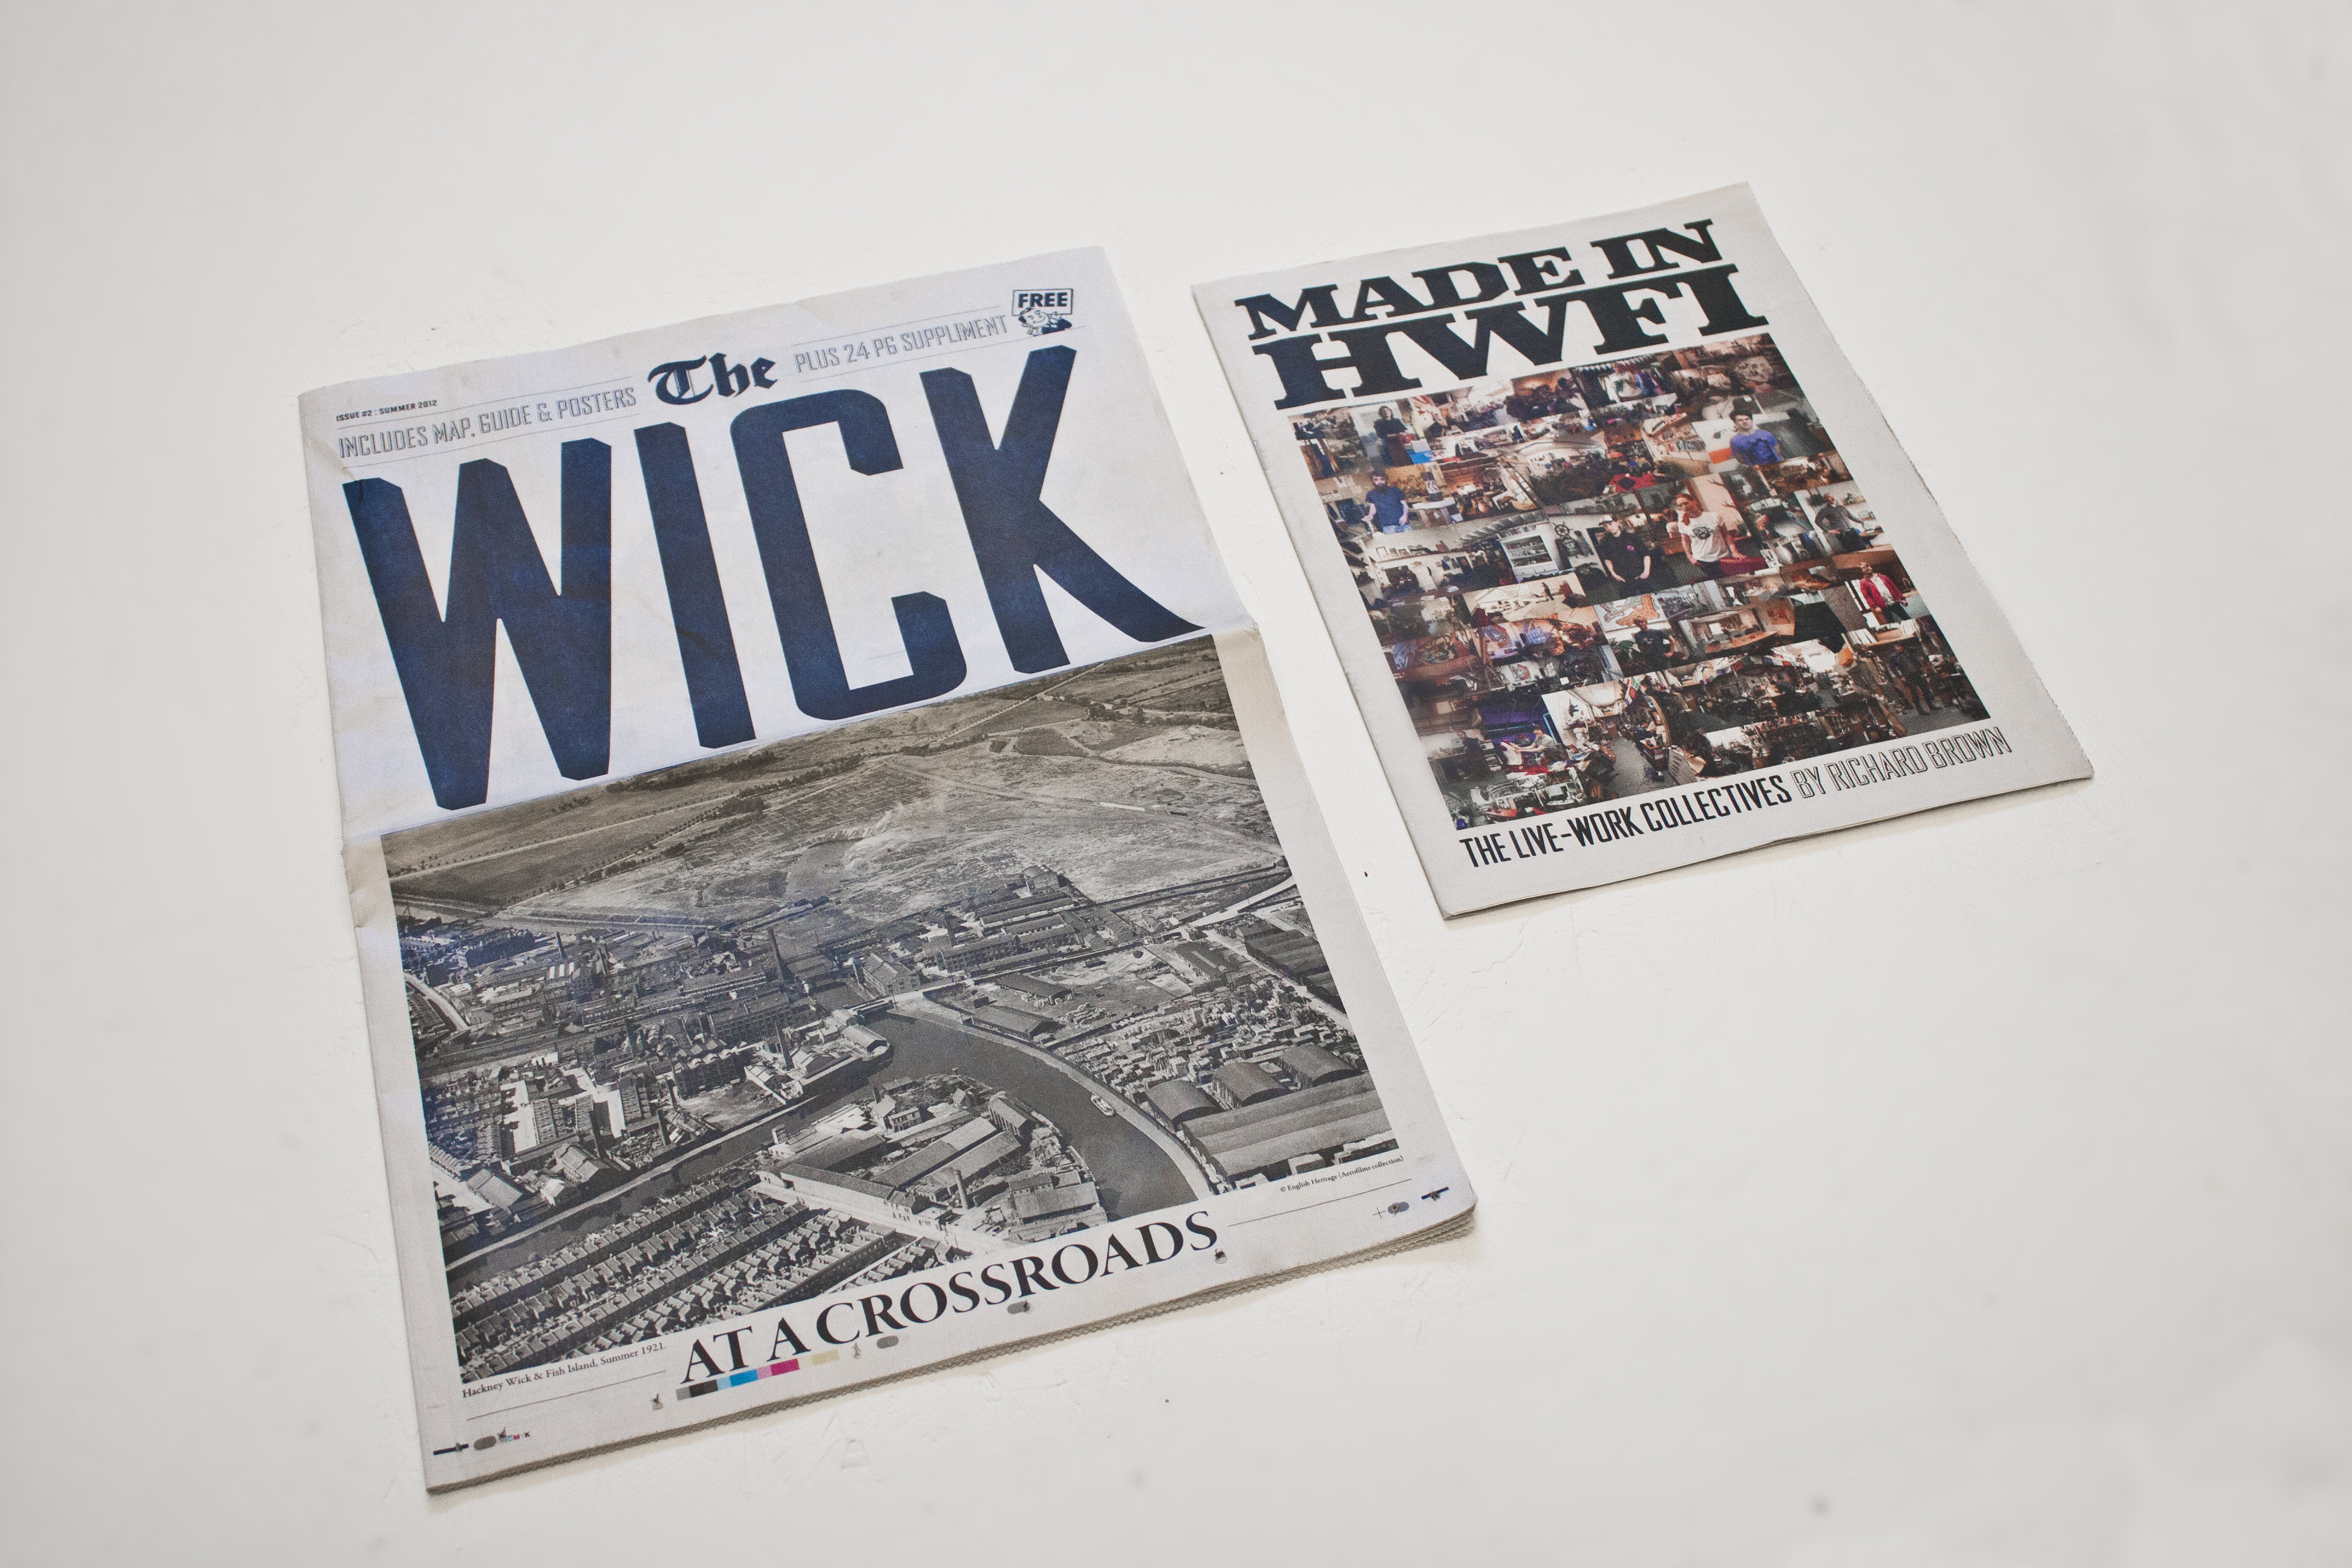 WICK NEWSPAPER